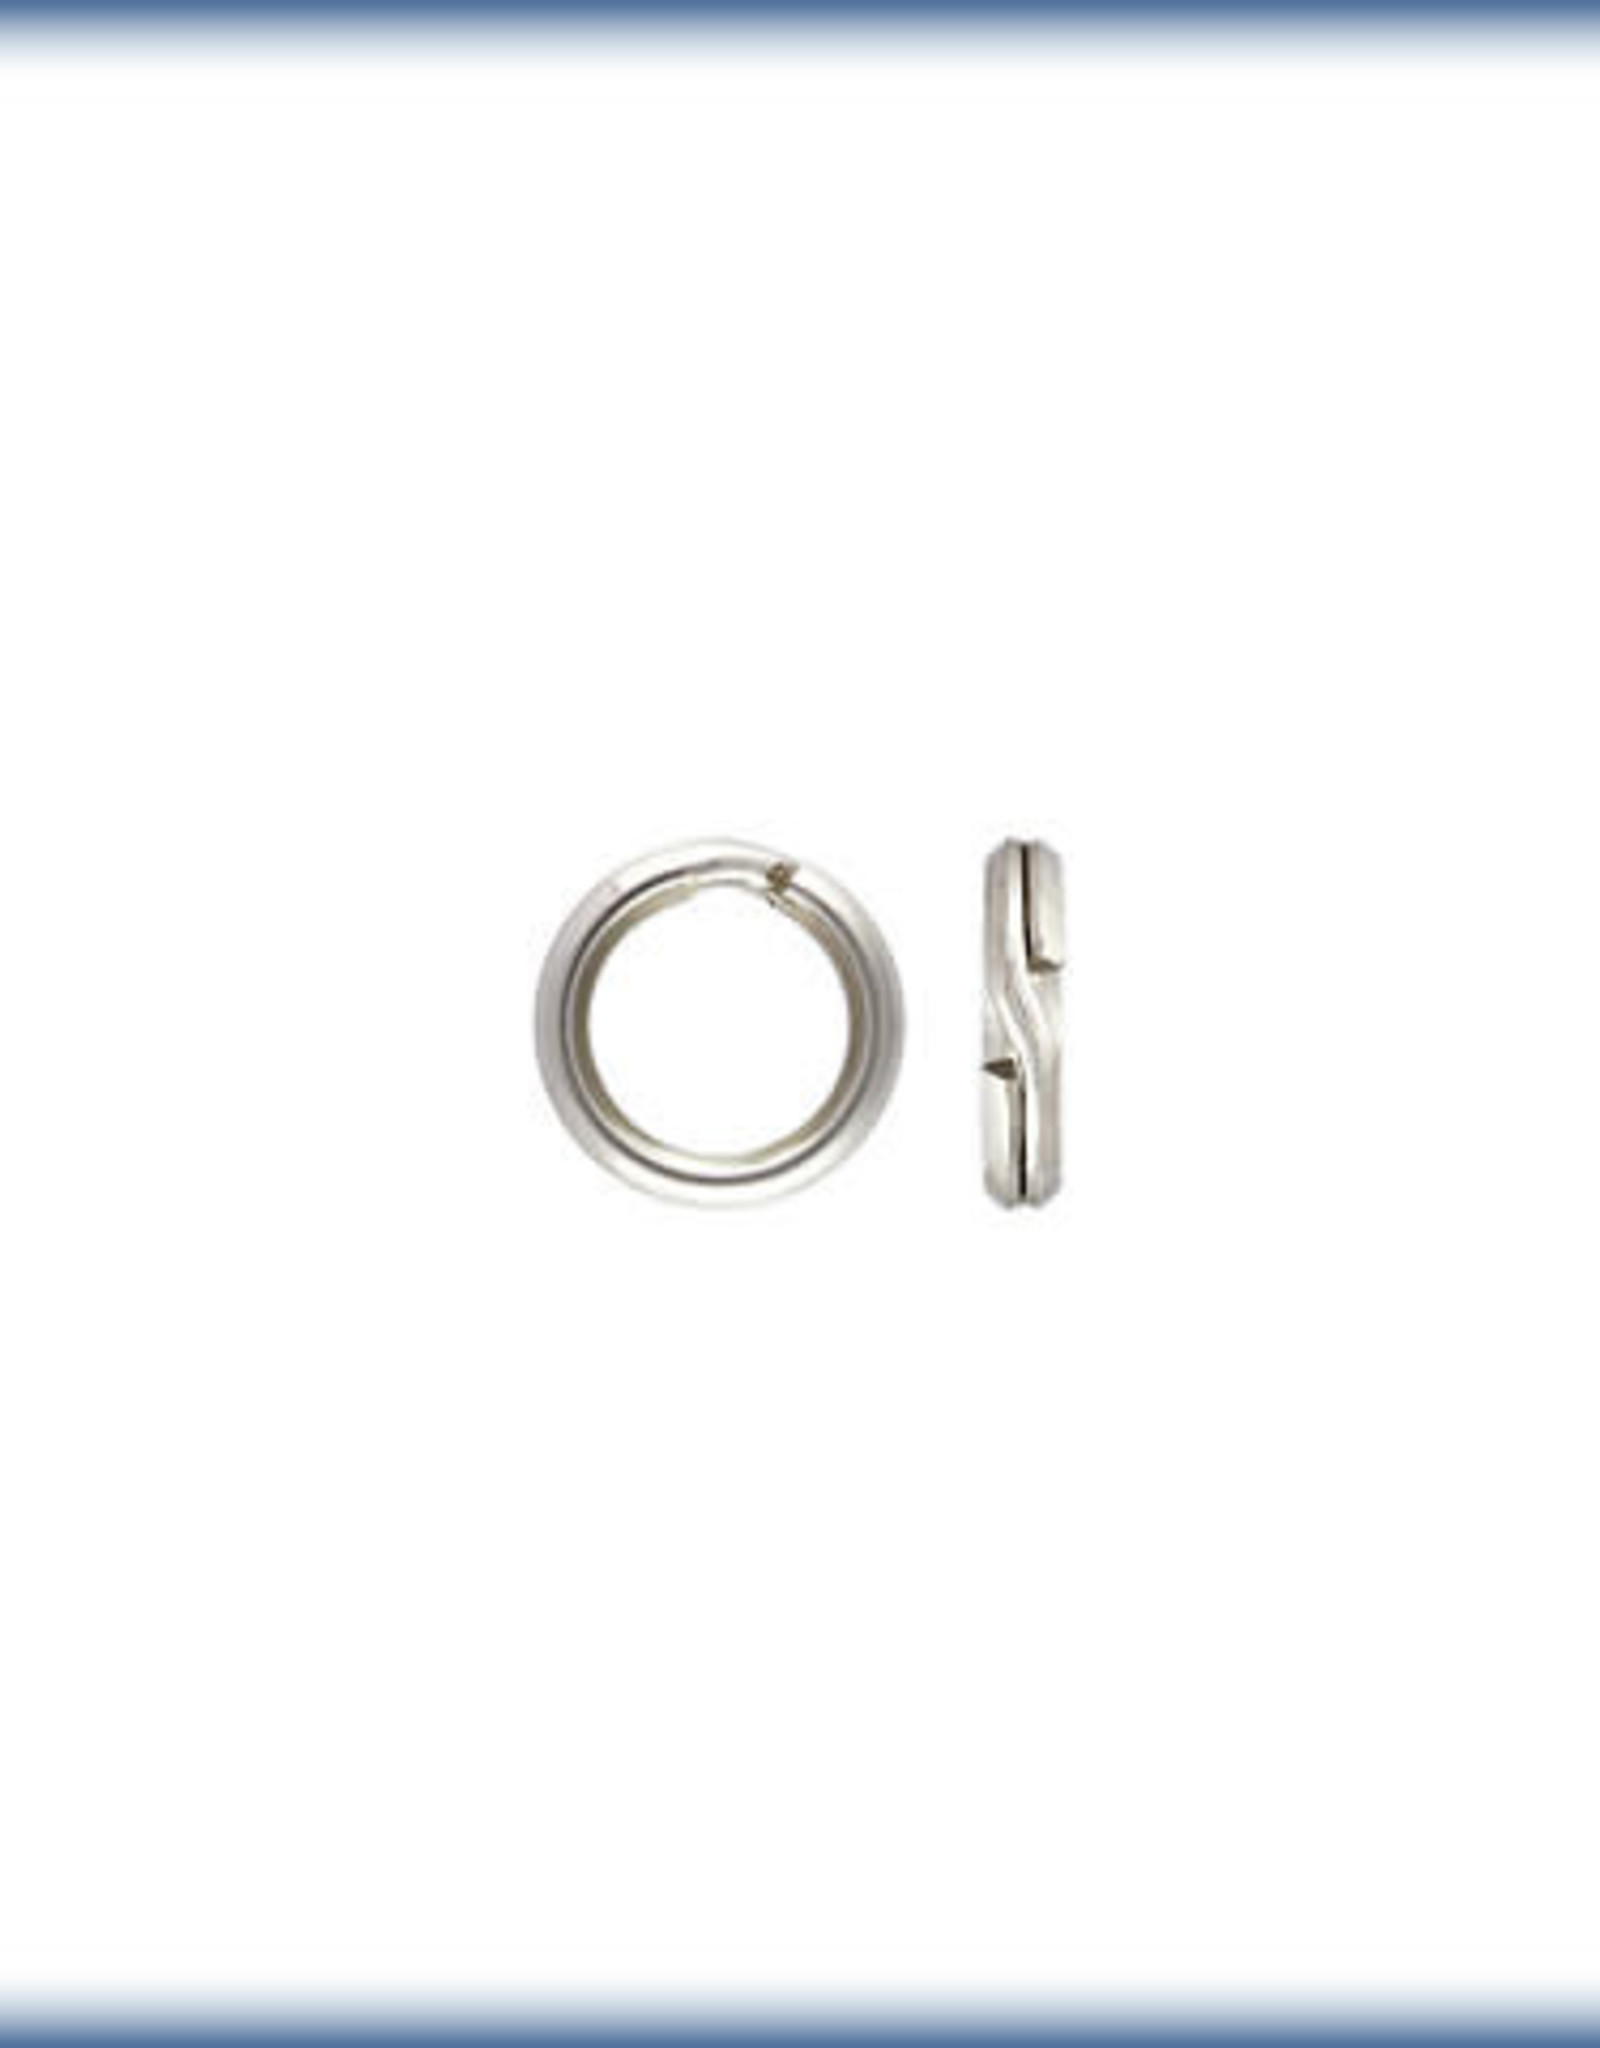 5mm Split Rings Sterling Silver Qty 10